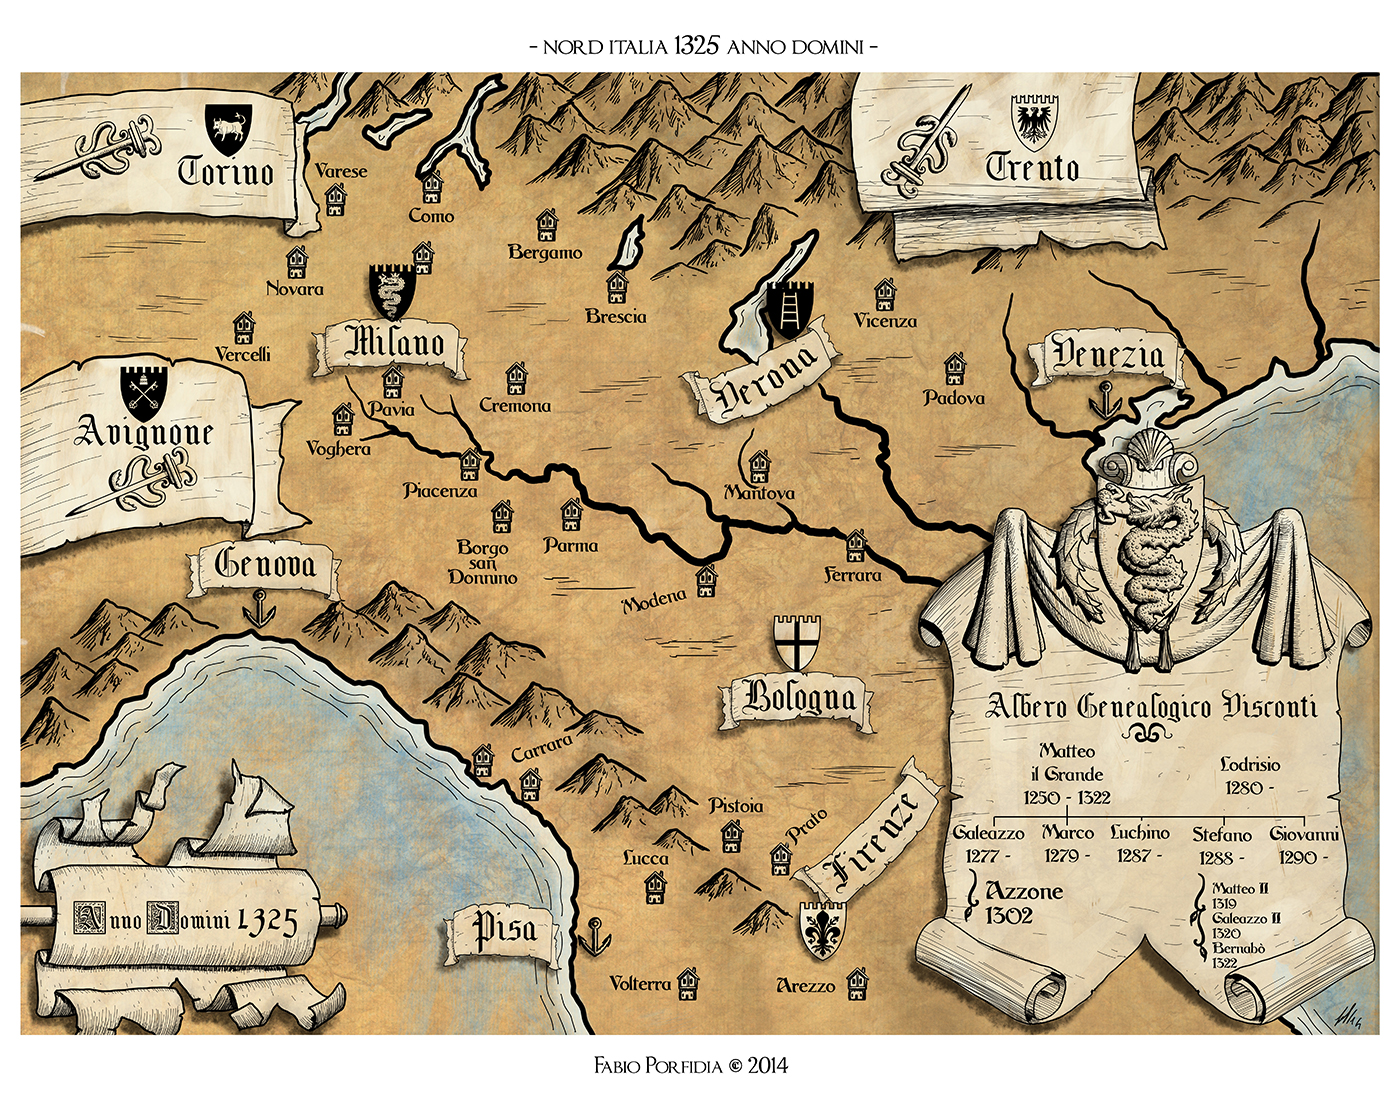 Nord Italia 1325